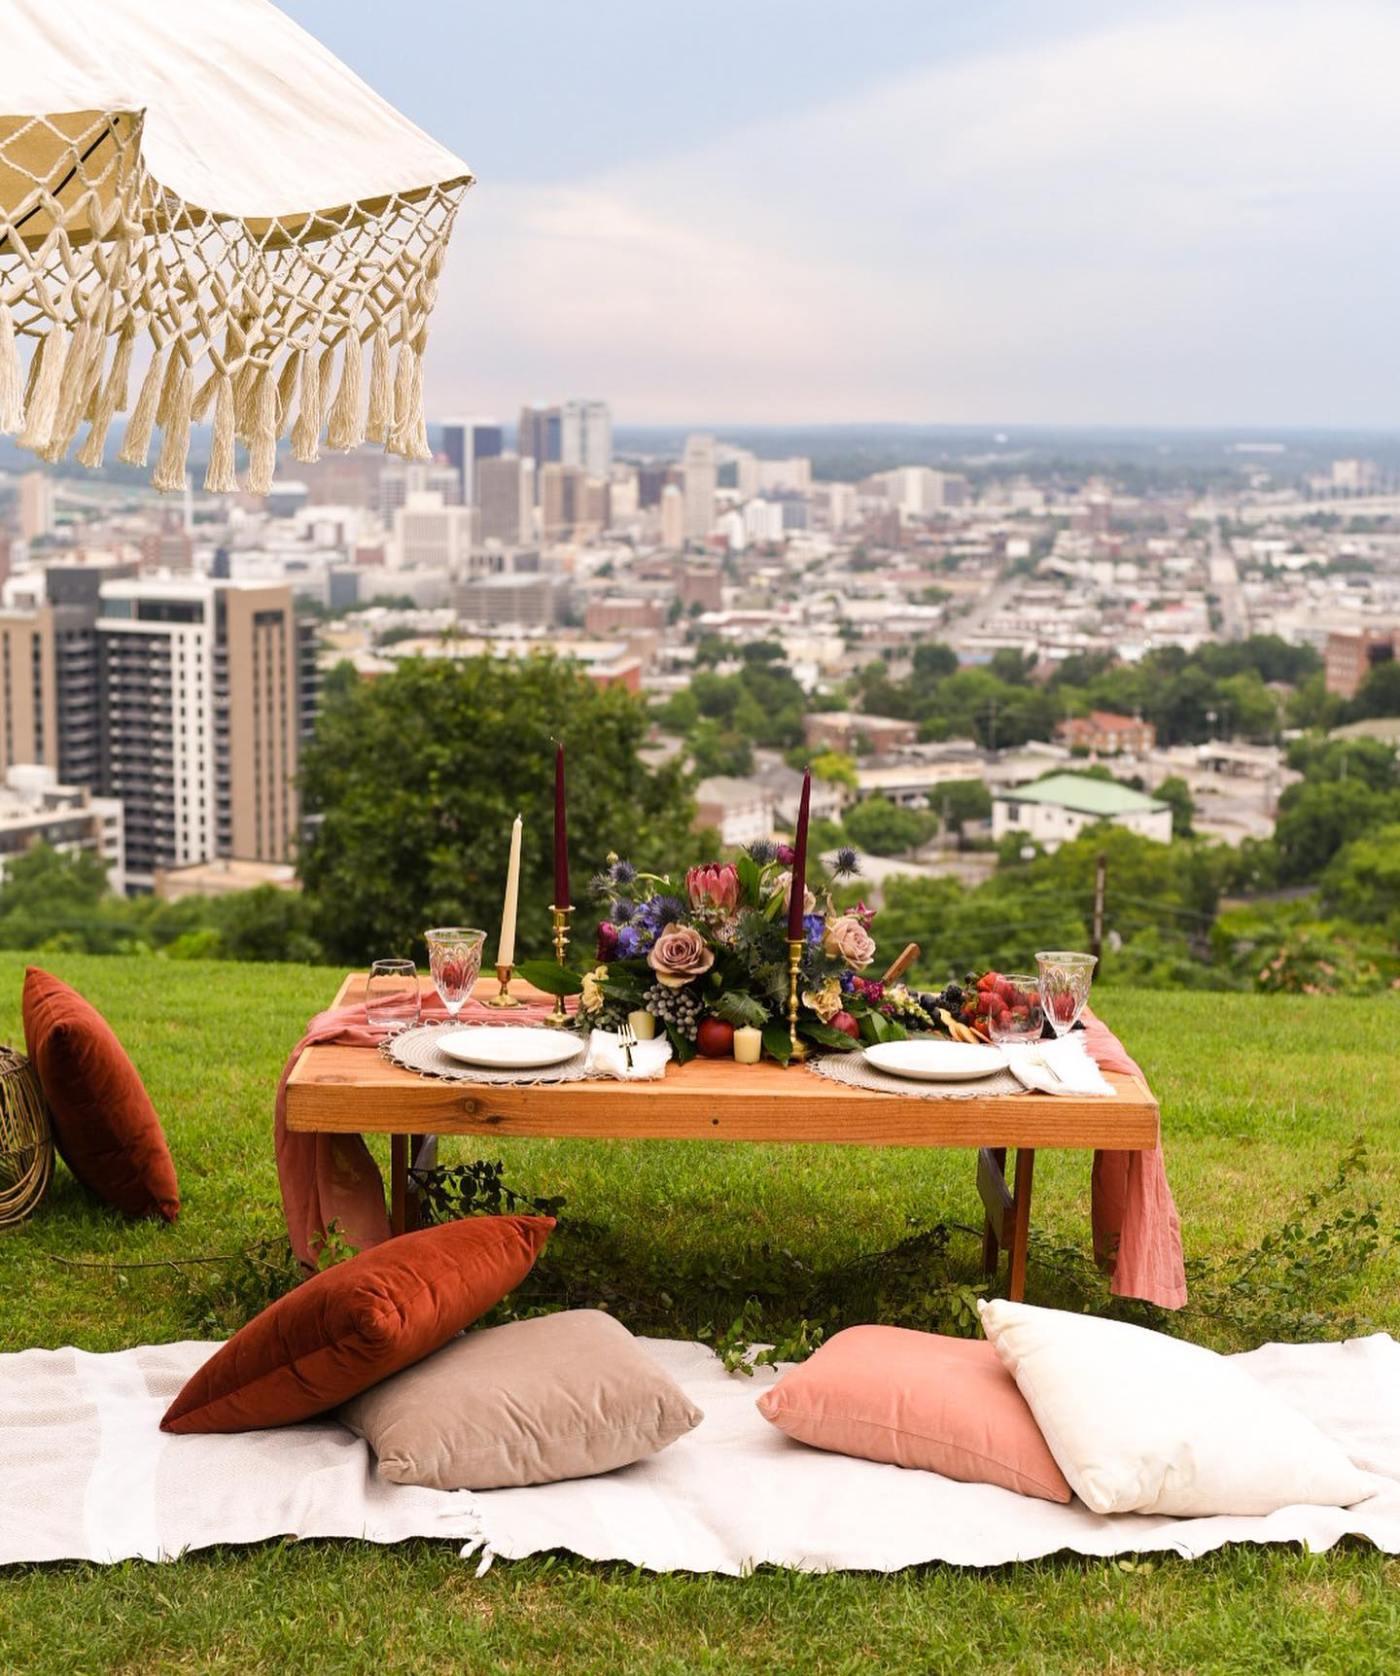 Birmingham luxury pop-up picnics - Fresno Picnic